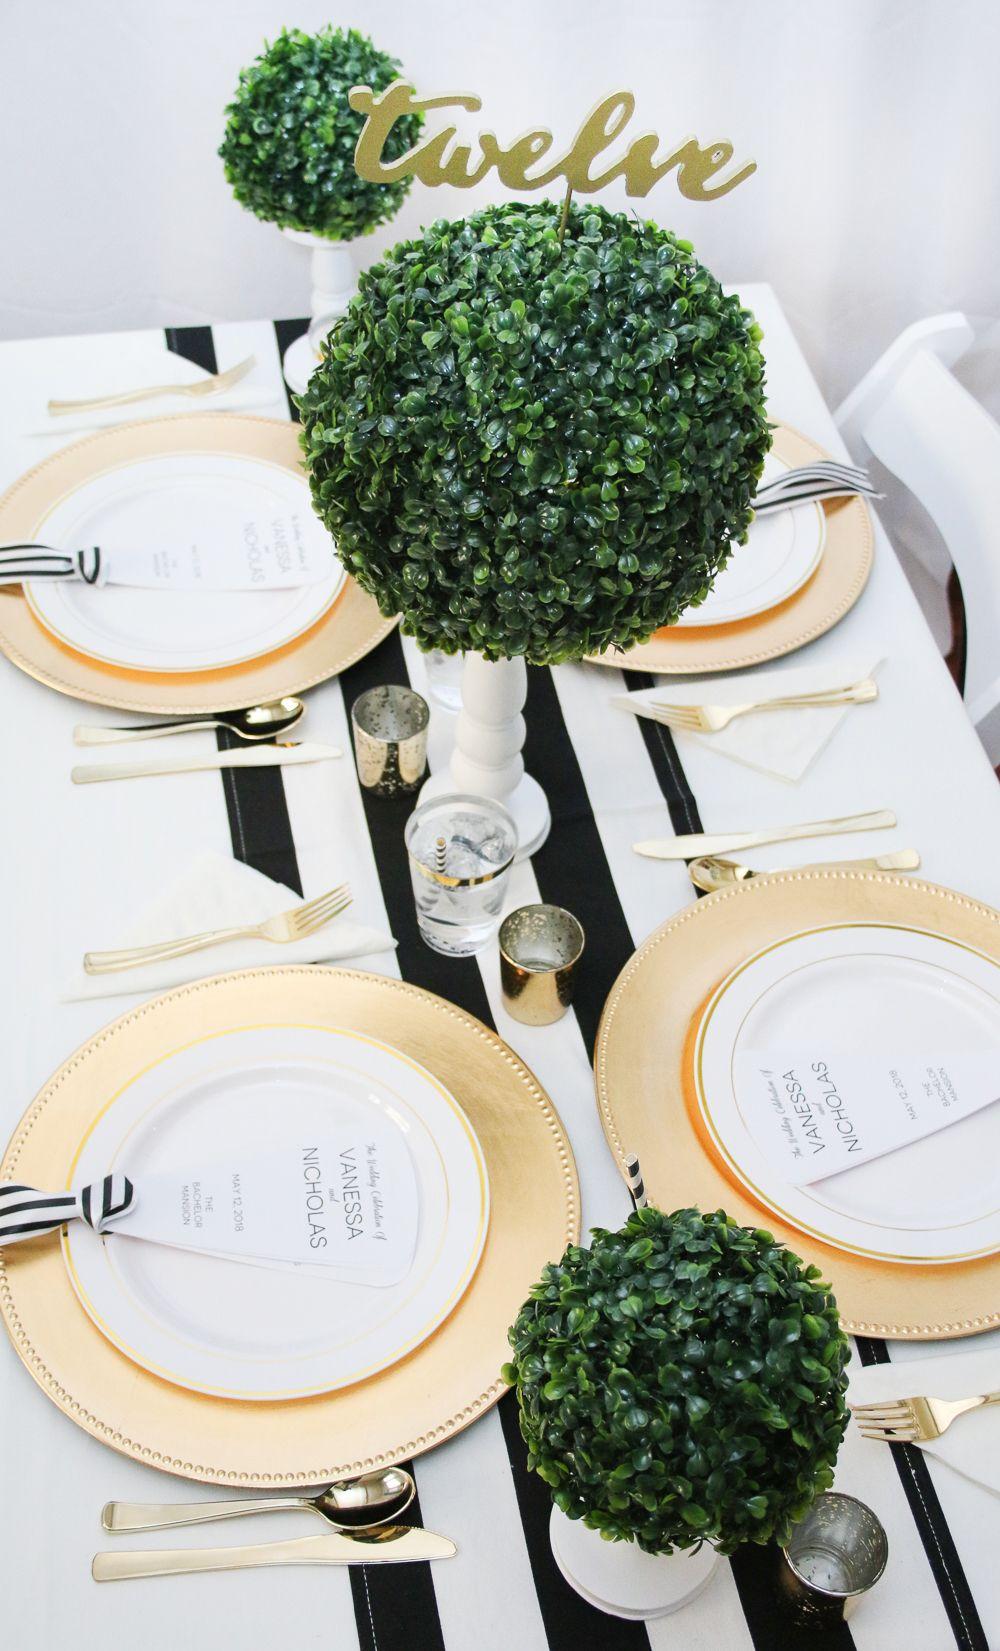 A Black, White, and Green Preppy Wedding Table Idea | Preppy wedding ...